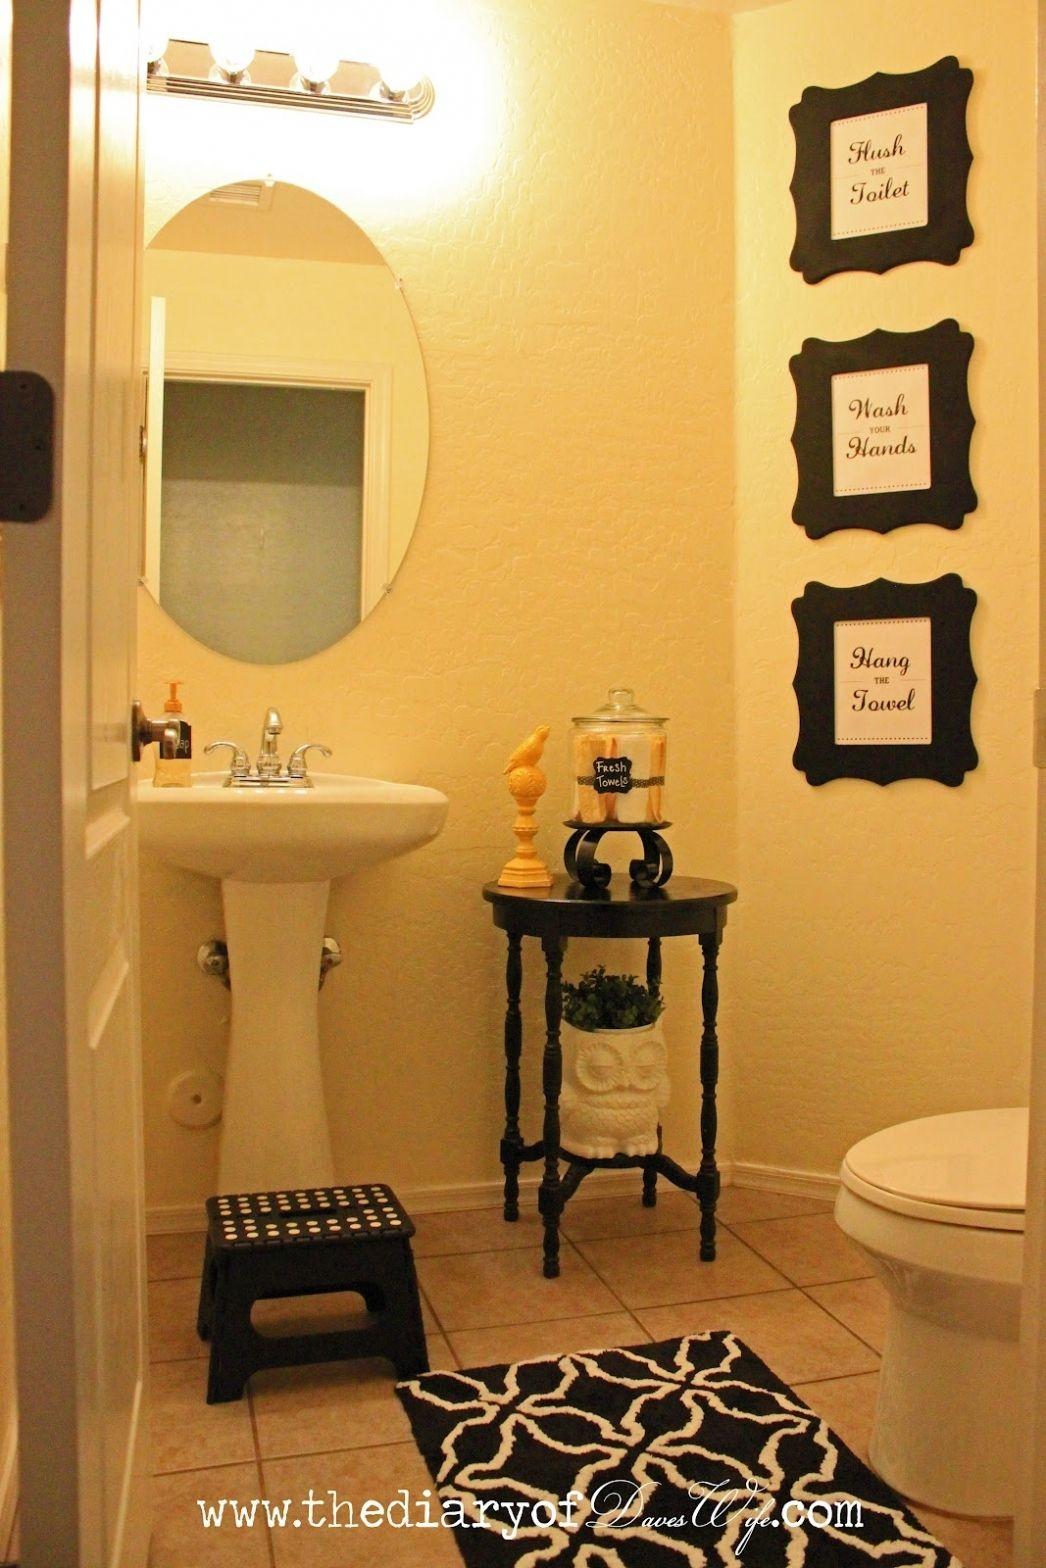 best of new guest half bathroom decorating ideas ij07zu